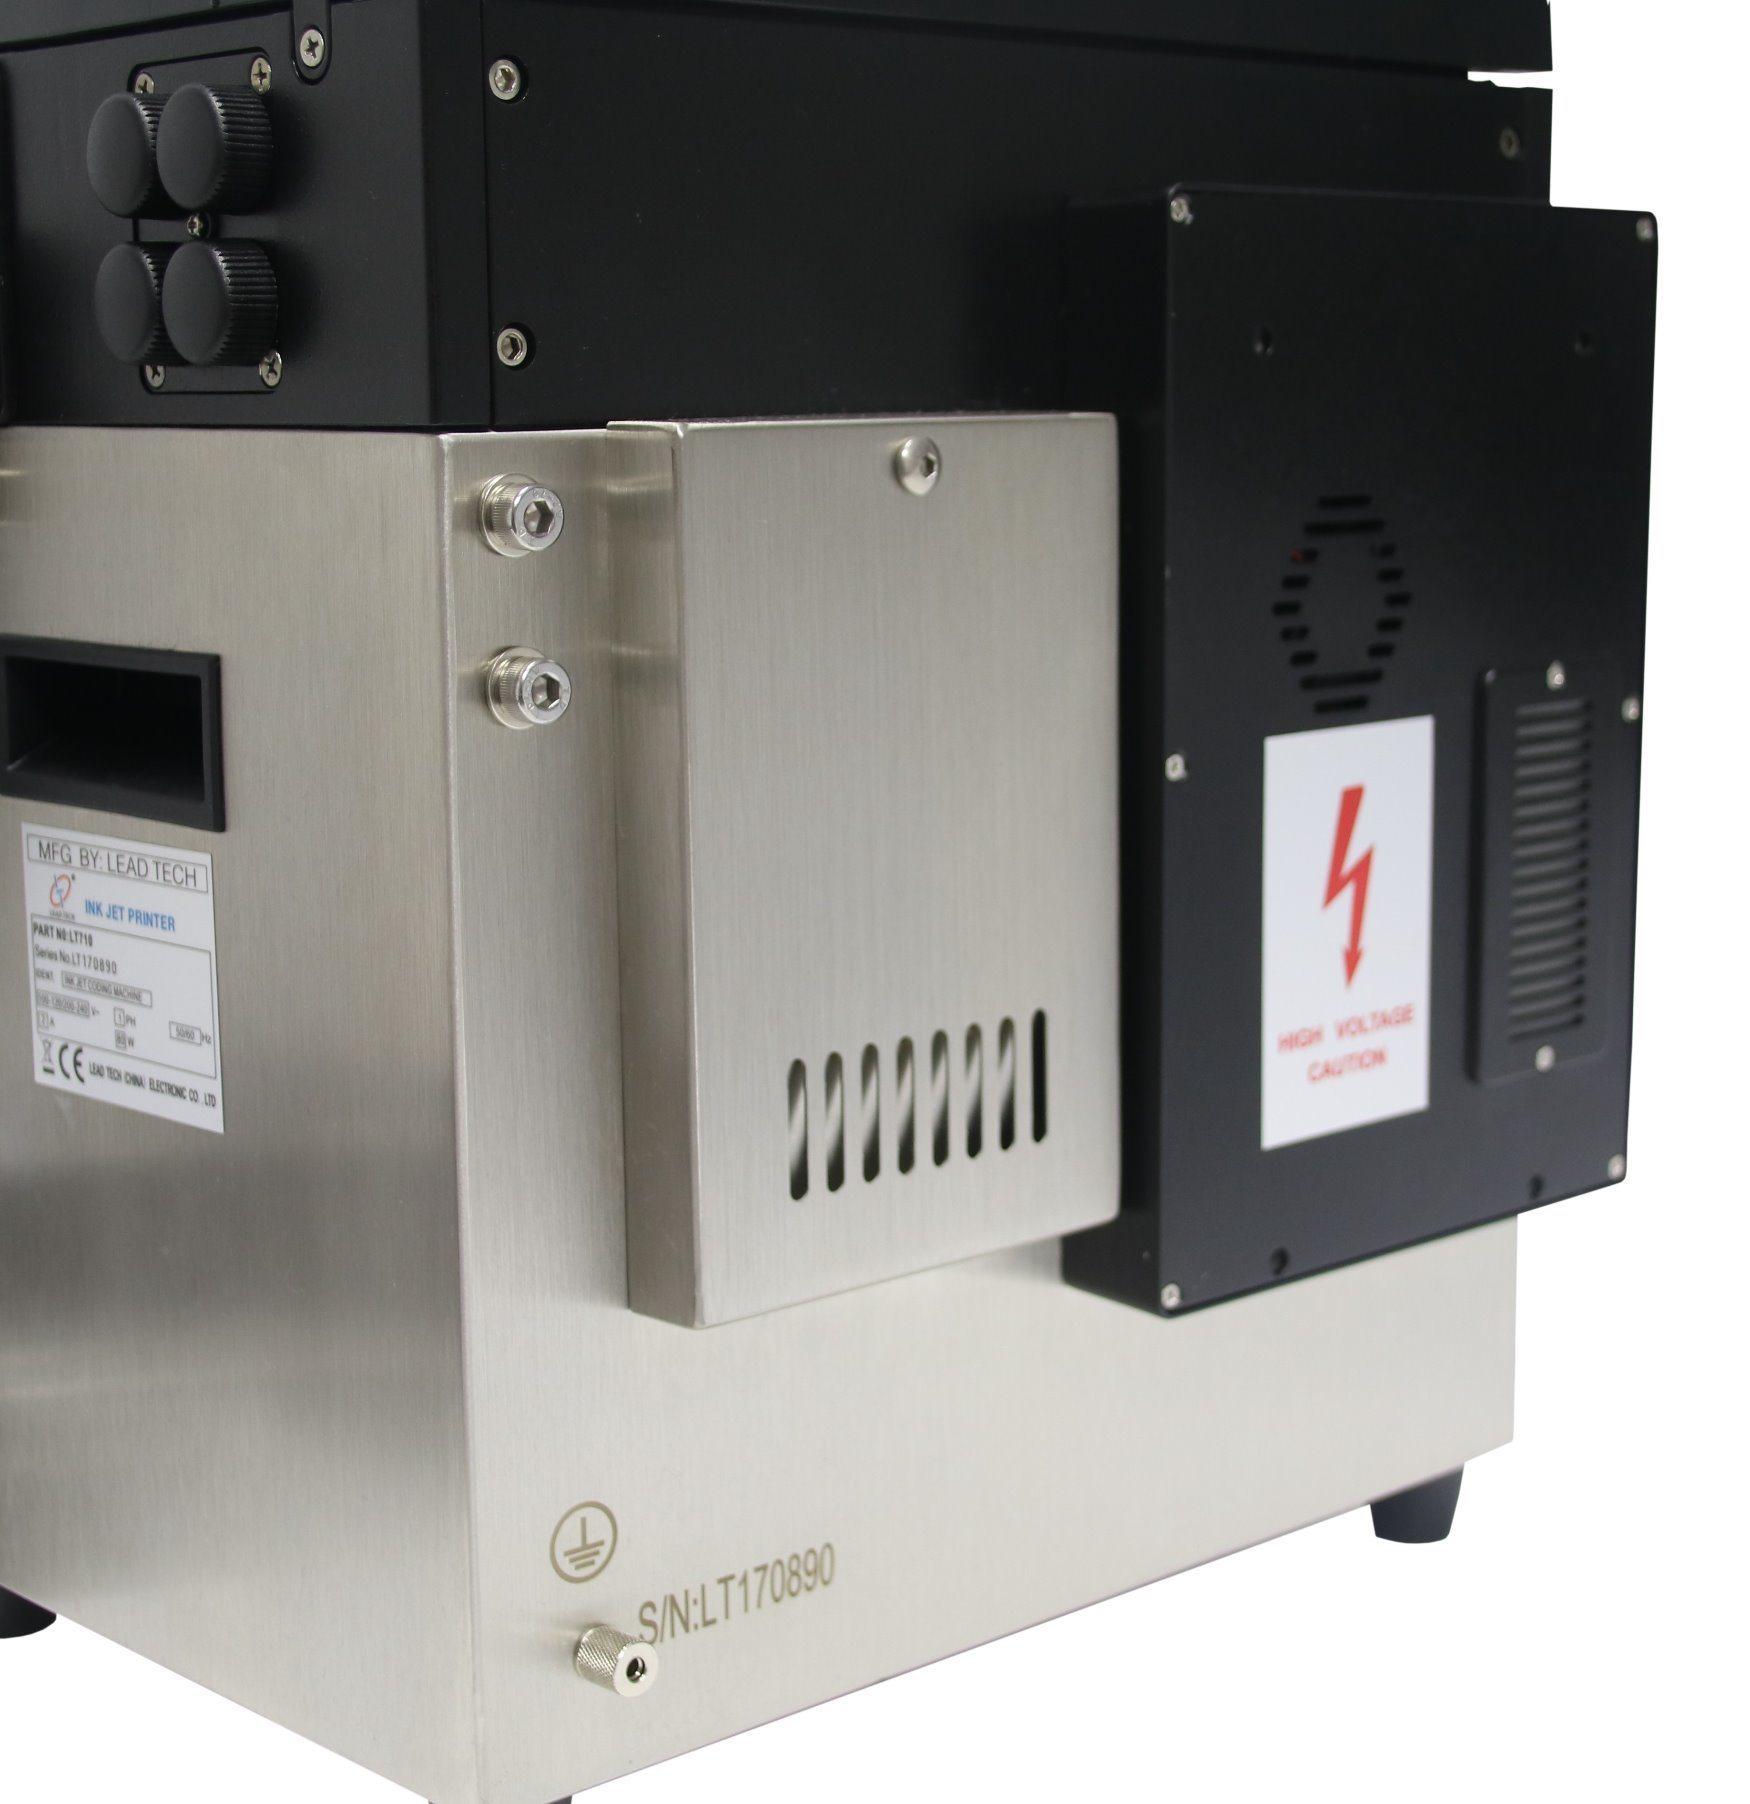 Lead Tech Lt760 Small Characters Reverse Printing Inkjet Printer